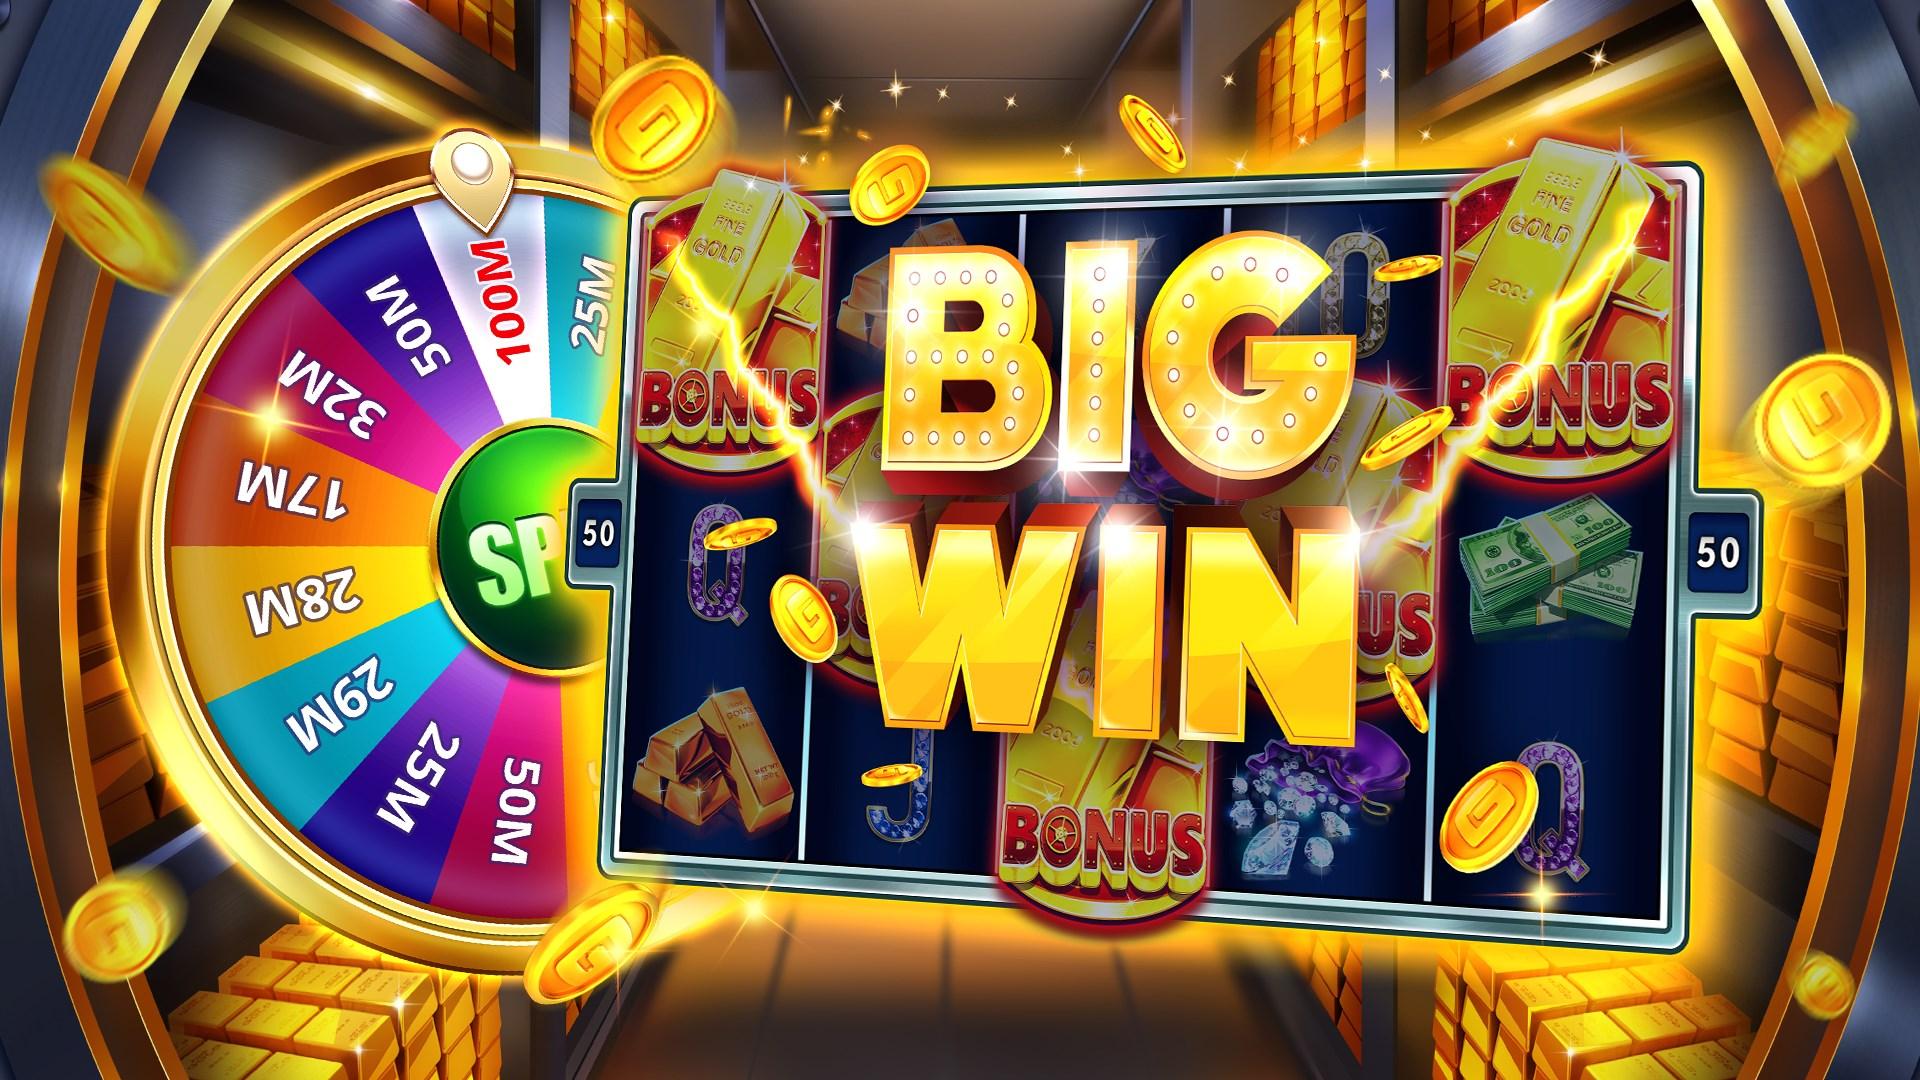 Enjoy Web Casino Gambling – Enhance the enjoyment and fun